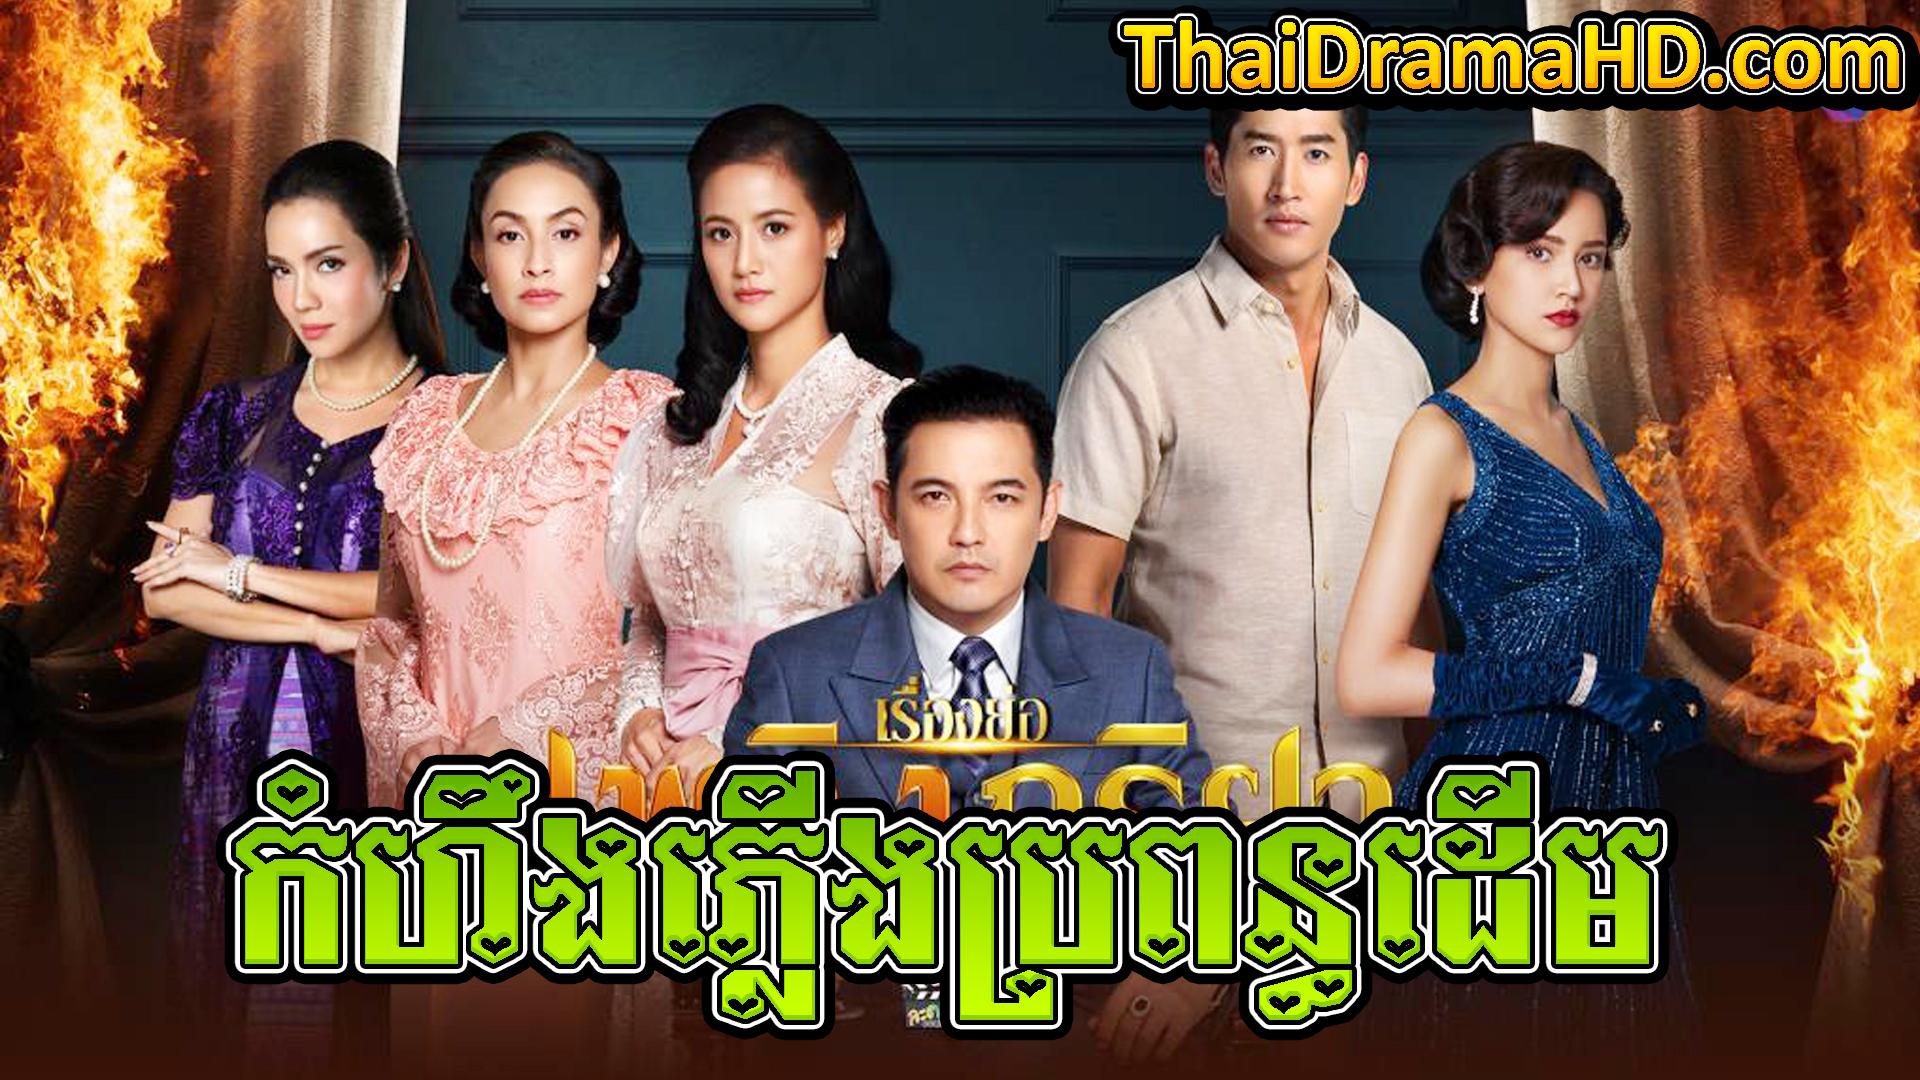 Kamhoeng Phleung Prapun Deum | Thai Drama | Khmer Movie | Phumikhmer | movie-khmer | video4khmer | khmotions | kolabkhmer | khmer drama | ksdrama | cookingtips | roscheat | khmertimeskh | khmerkomsan | phumi7 | merlkon | film2us | movie2kh | sweetdrama | khmercitylove | khreplay | tvb cambodia drama | ckh7 | srokthai | phumimedia | phumi8 | khmer avenue | khmer search | Soyo | khmerfans